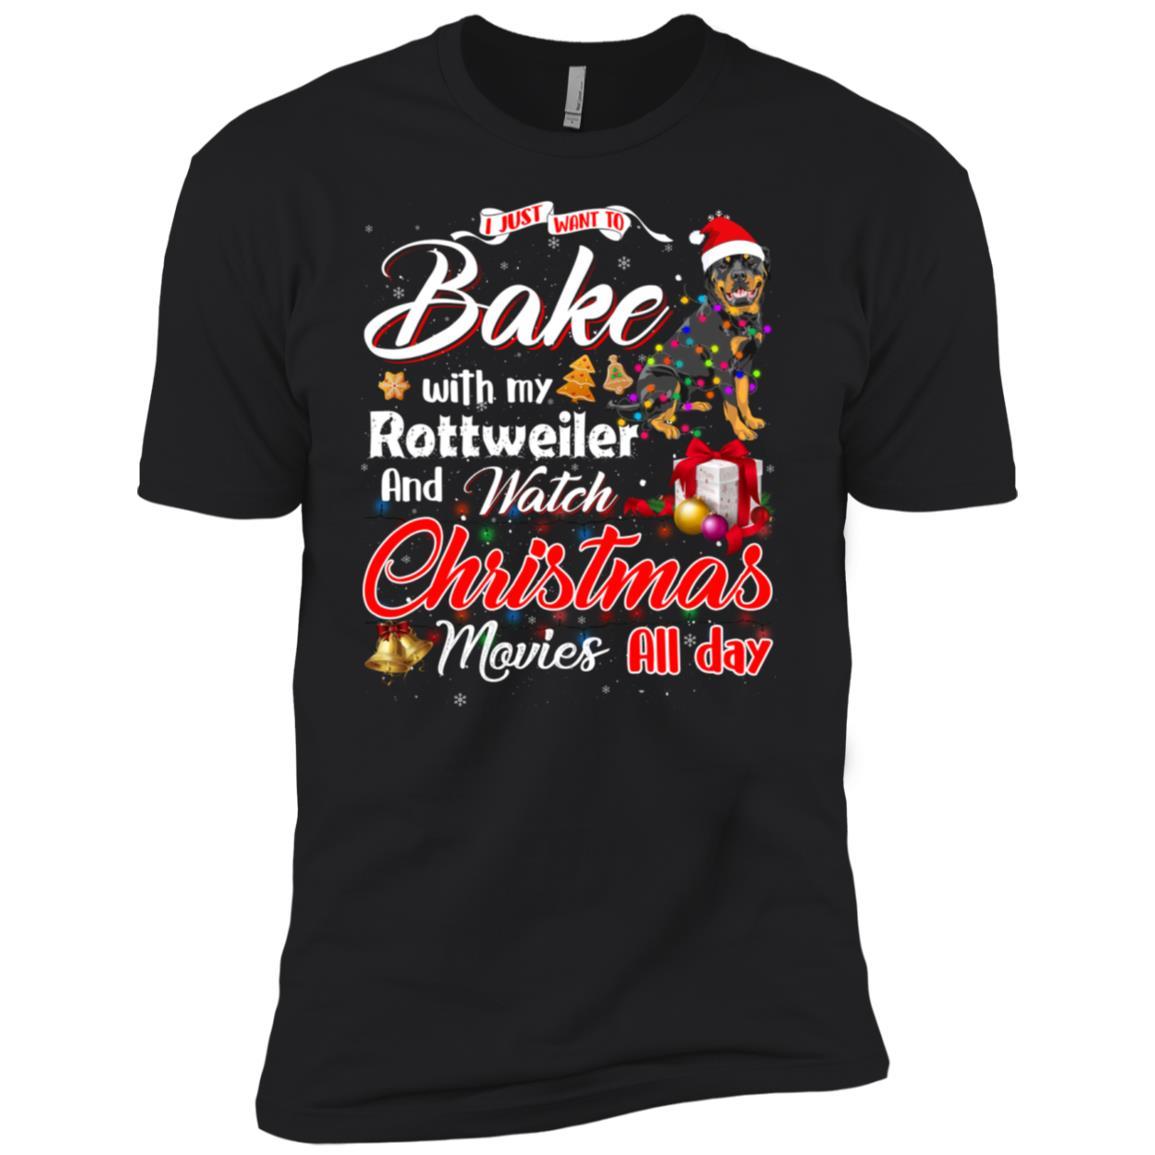 Bake Stuff with Rottweiler Watch Christmas Movies Long Sleev Men Short Sleeve T-Shirt